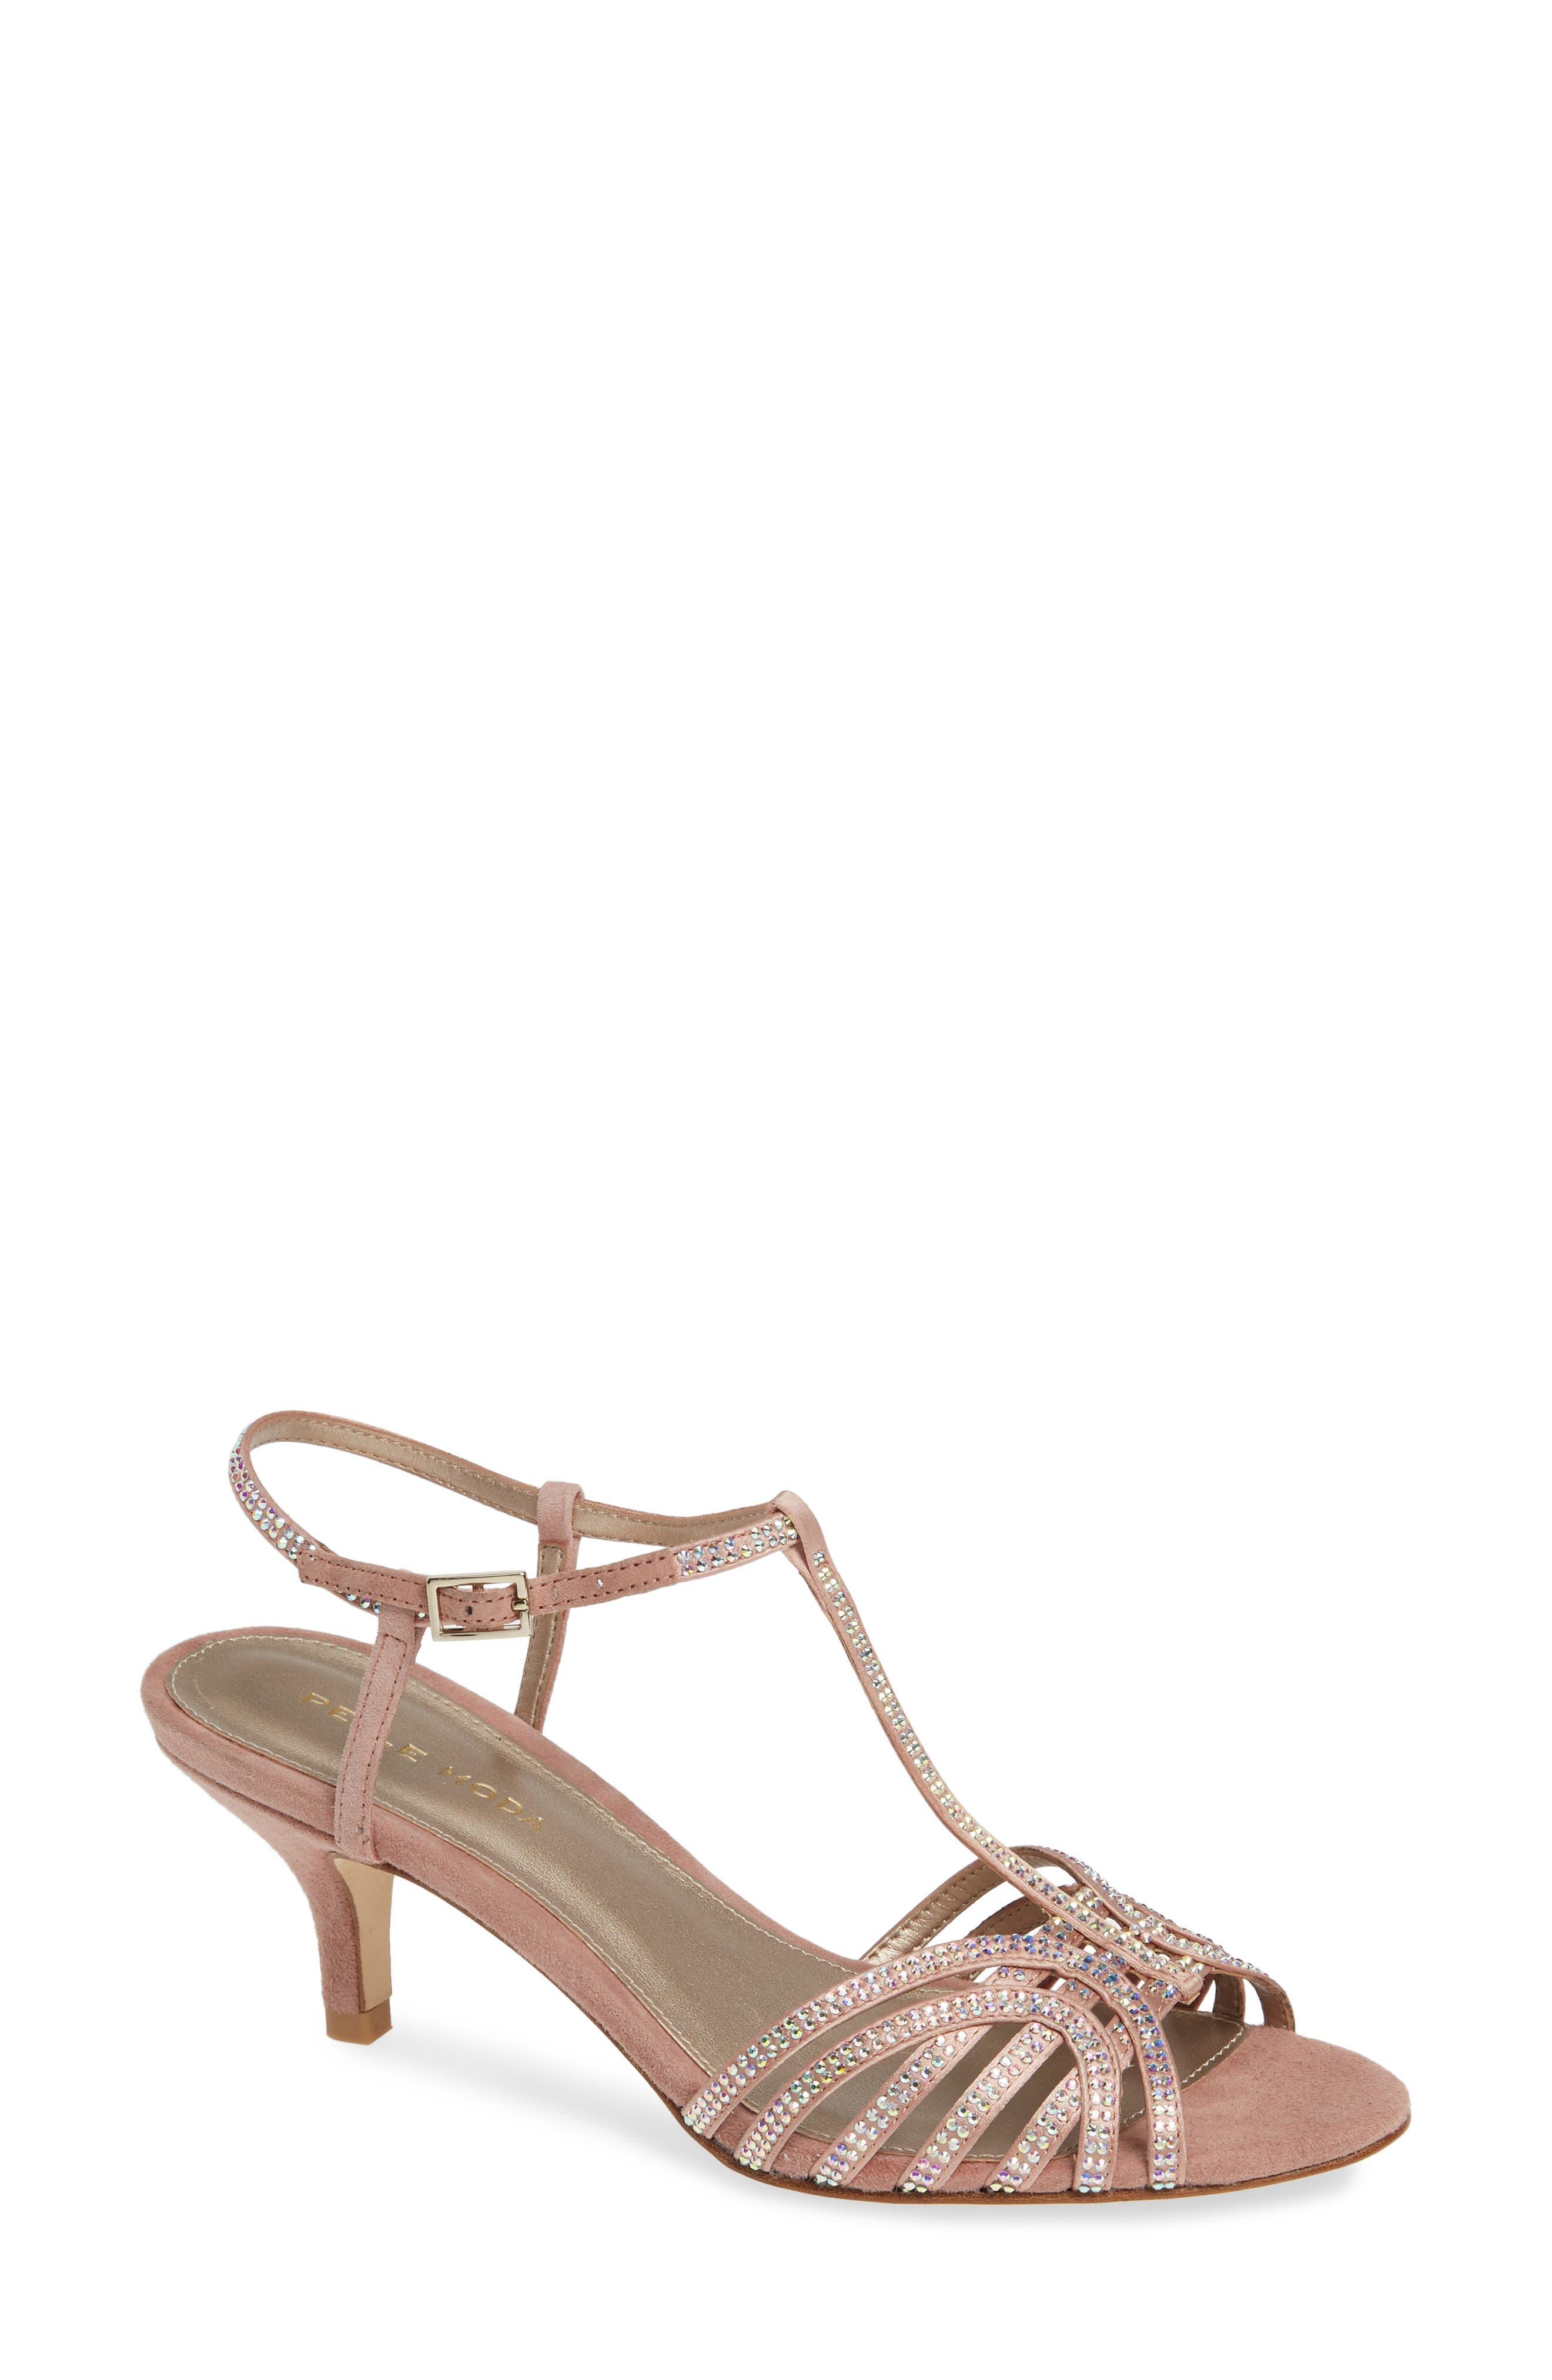 Pelle Moda Ilane Sandal, Pink